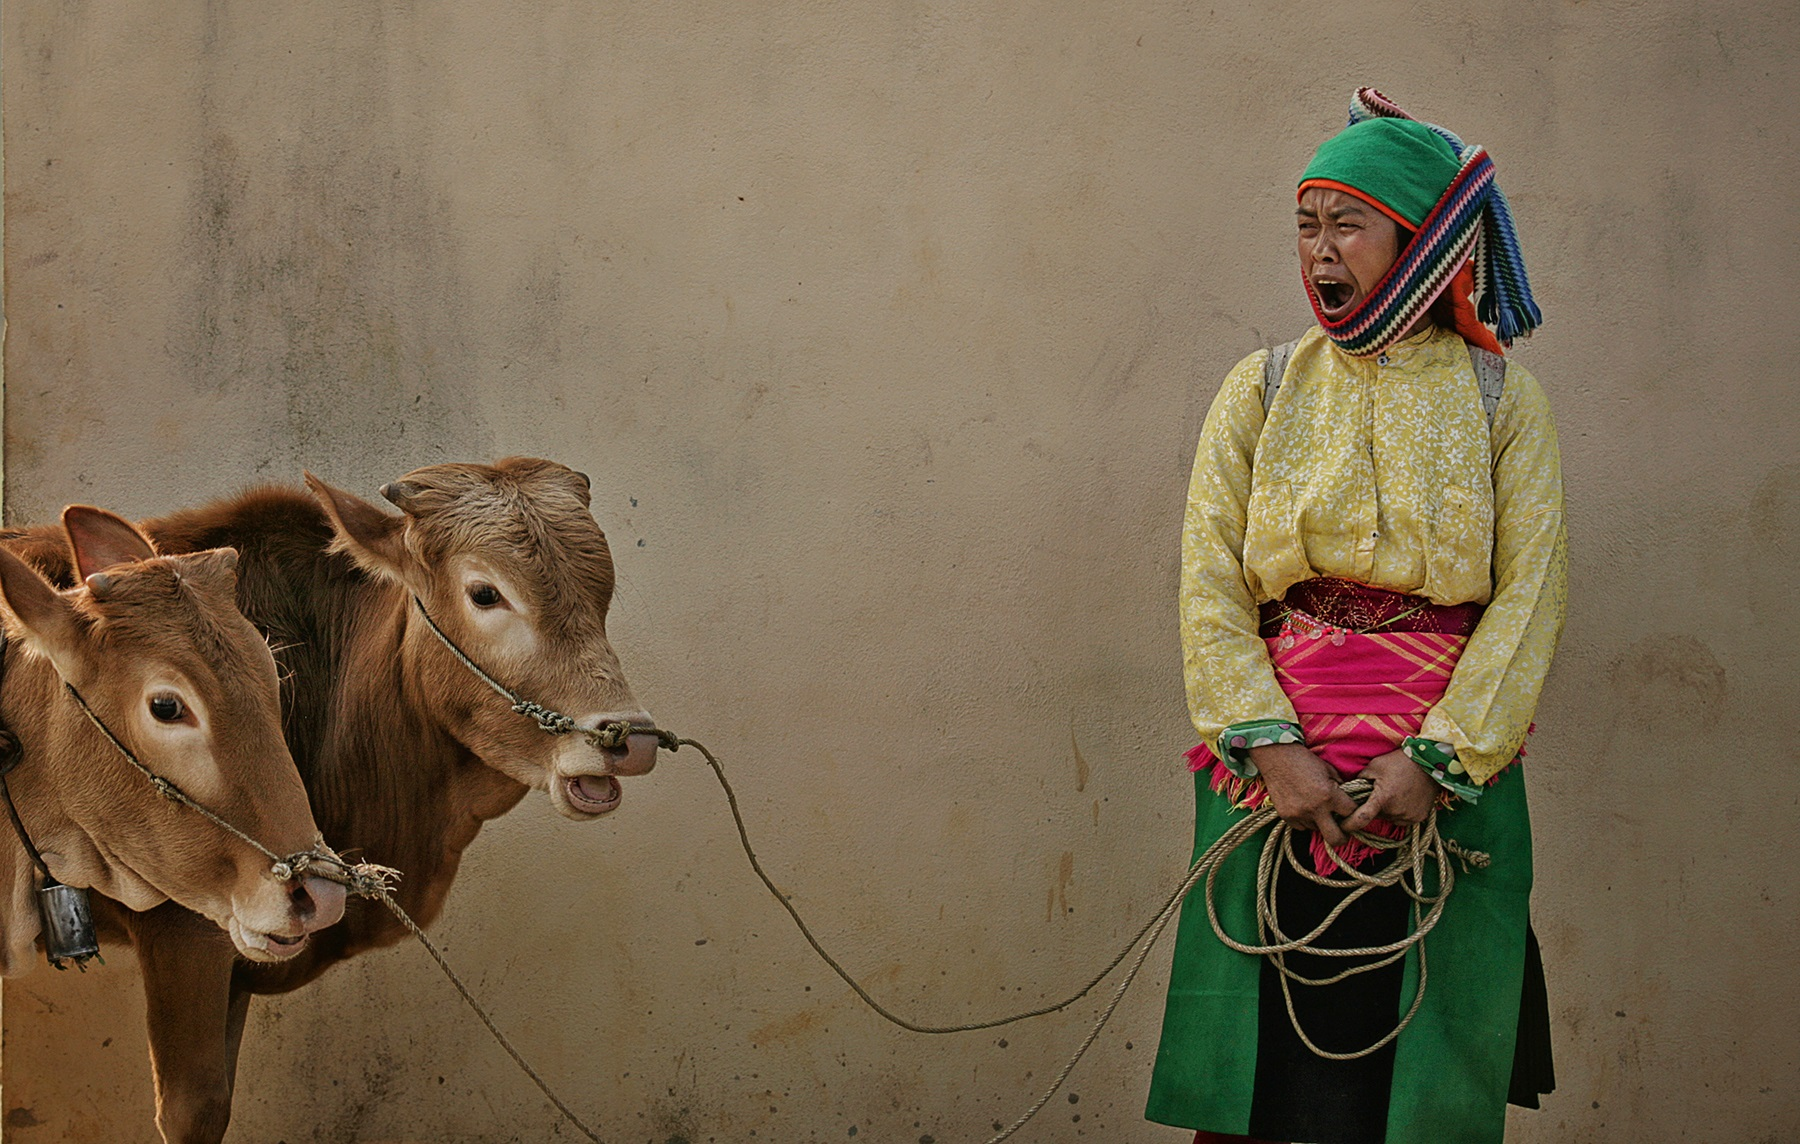 Lensman's journey captures daily moments across Vietnam's northern highlands